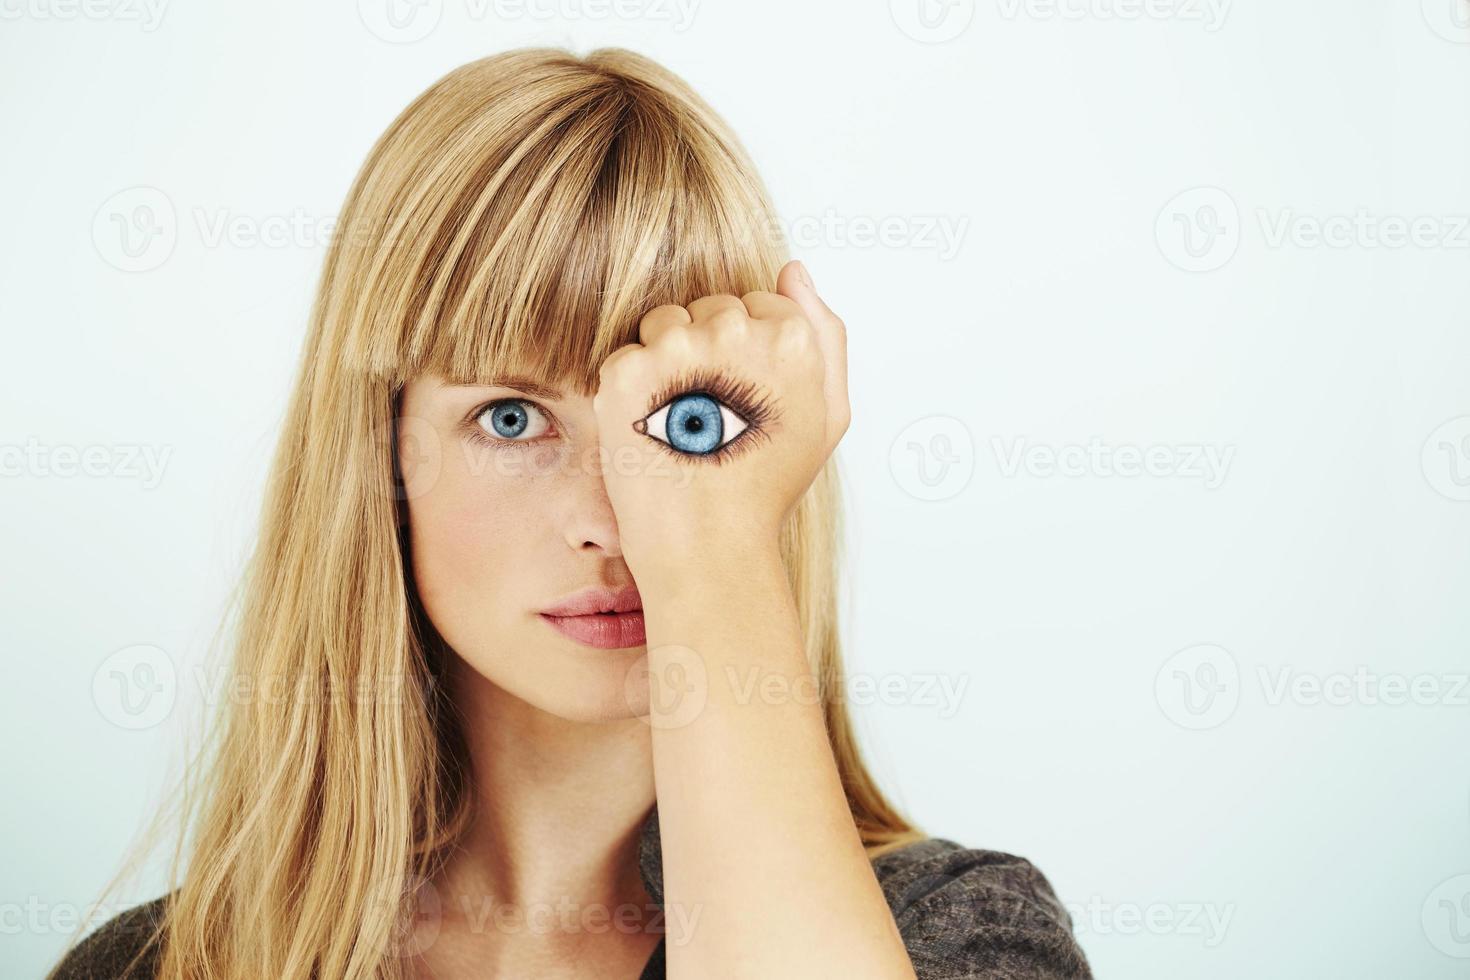 femme regardant avec oeil peint photo